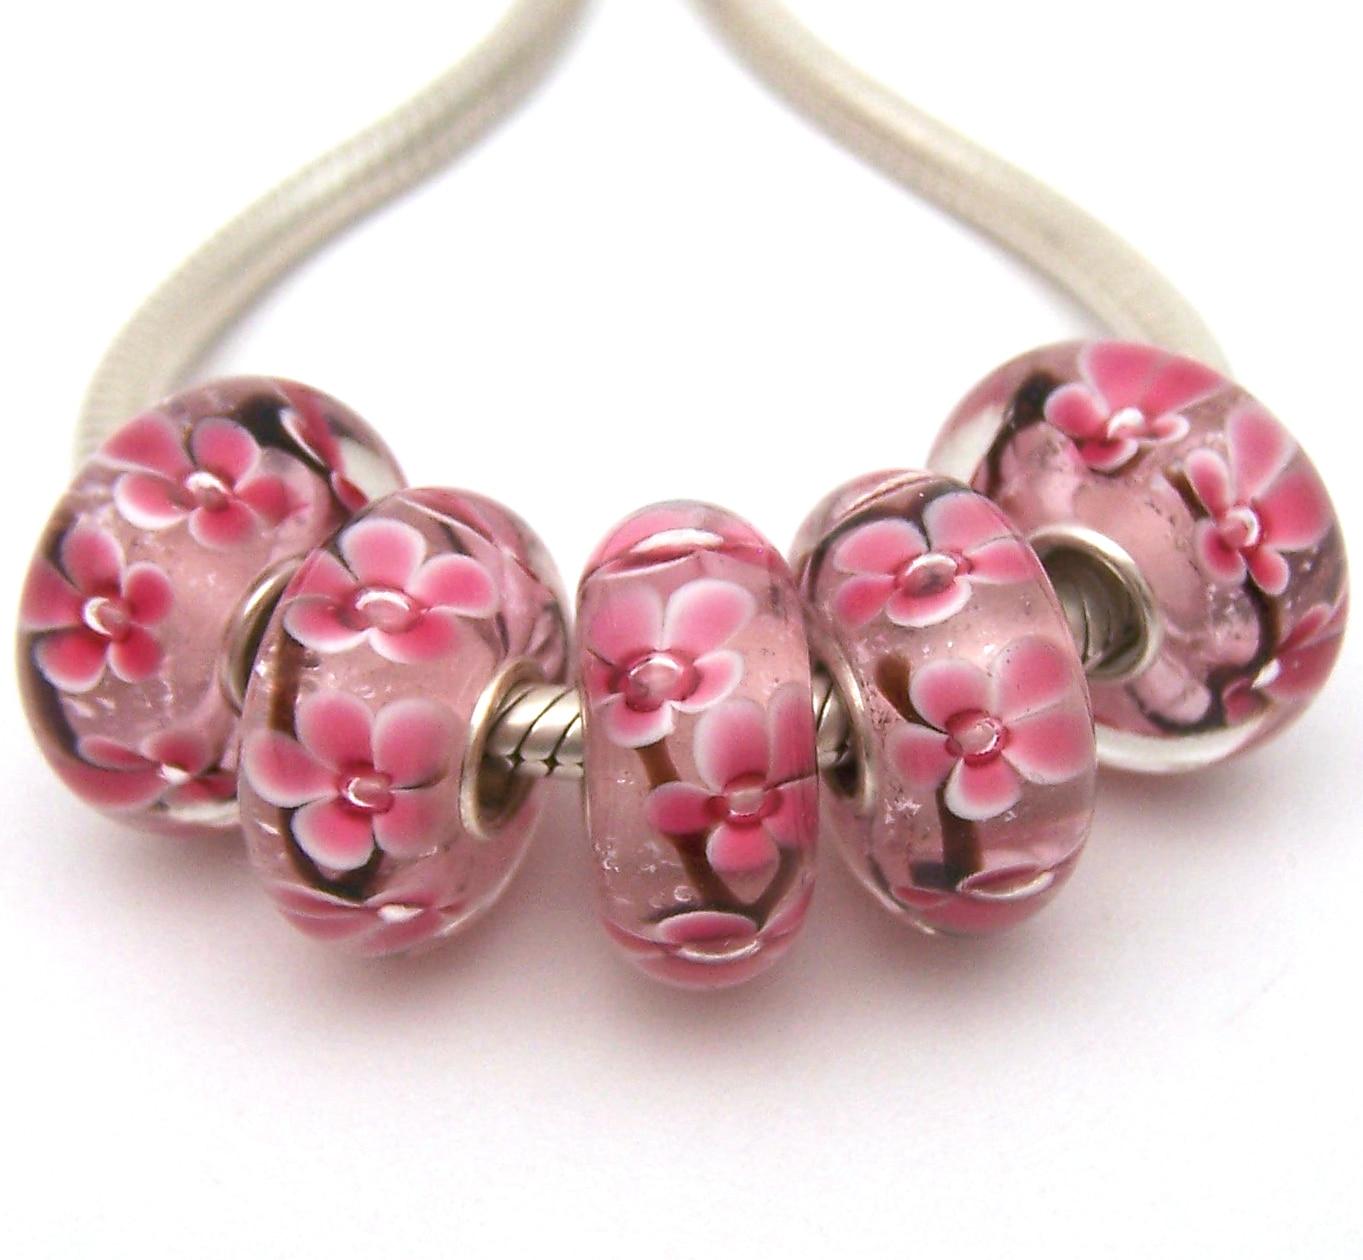 JGWG798 5X 100% Authentizität S925 Sterling Silber Perlen Murano Glas perlen Fit Europäischen Charme Armband diy schmuck Murano